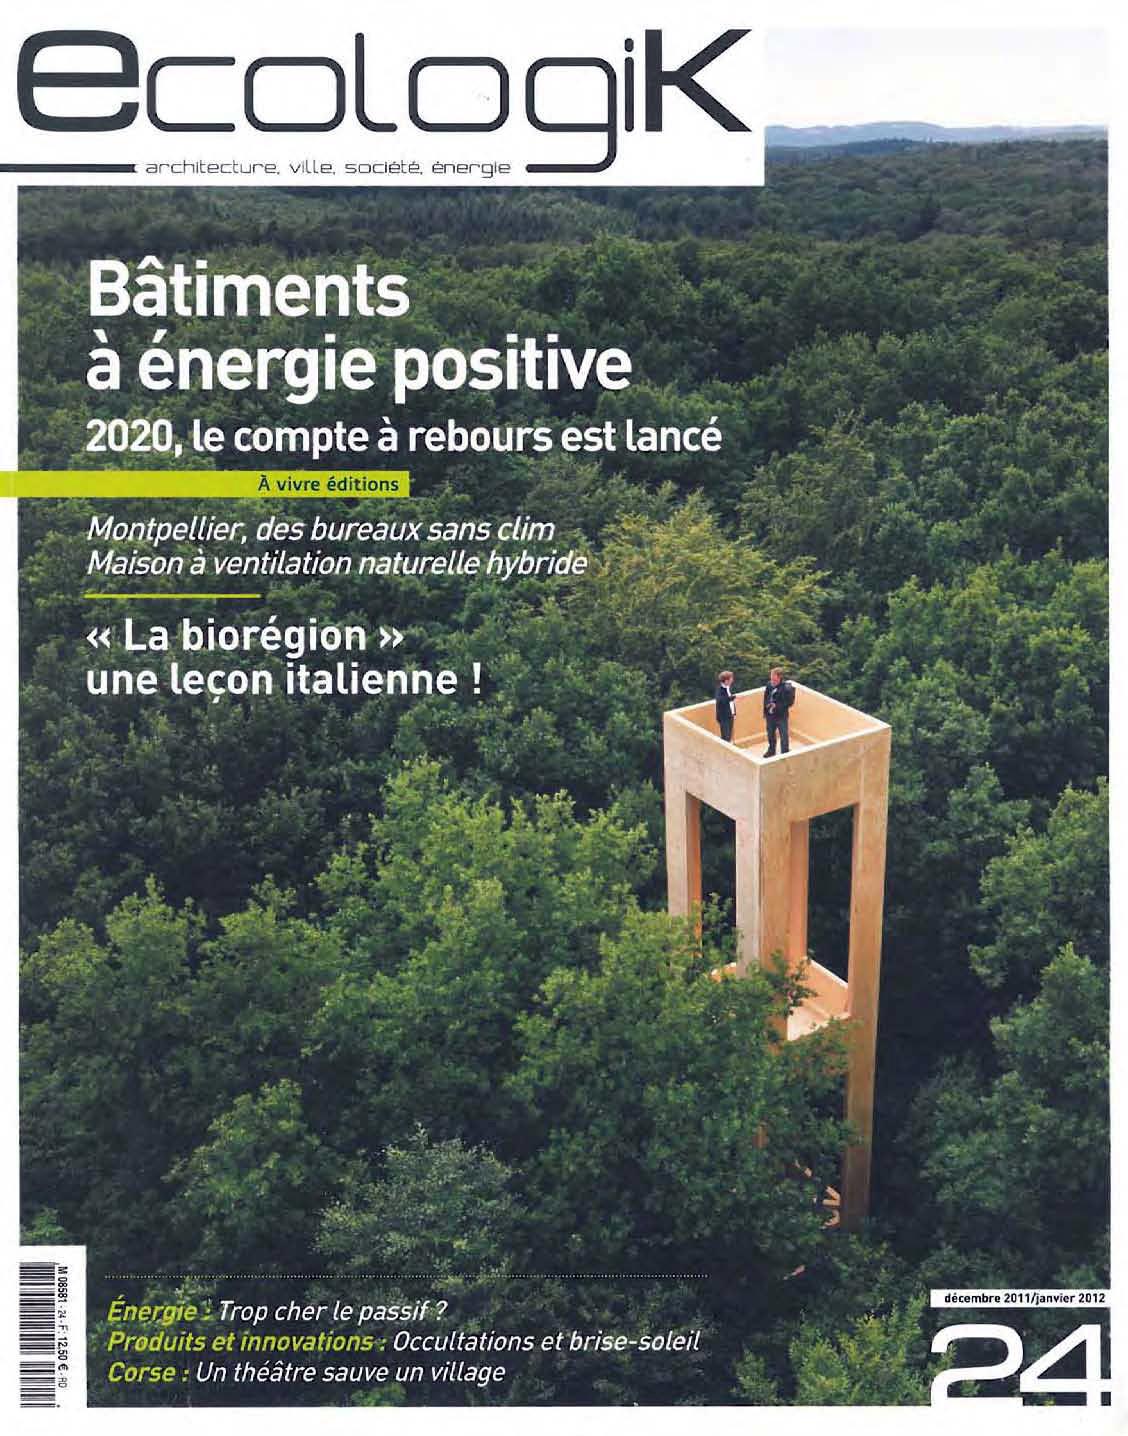 Ecologik - 01/2012